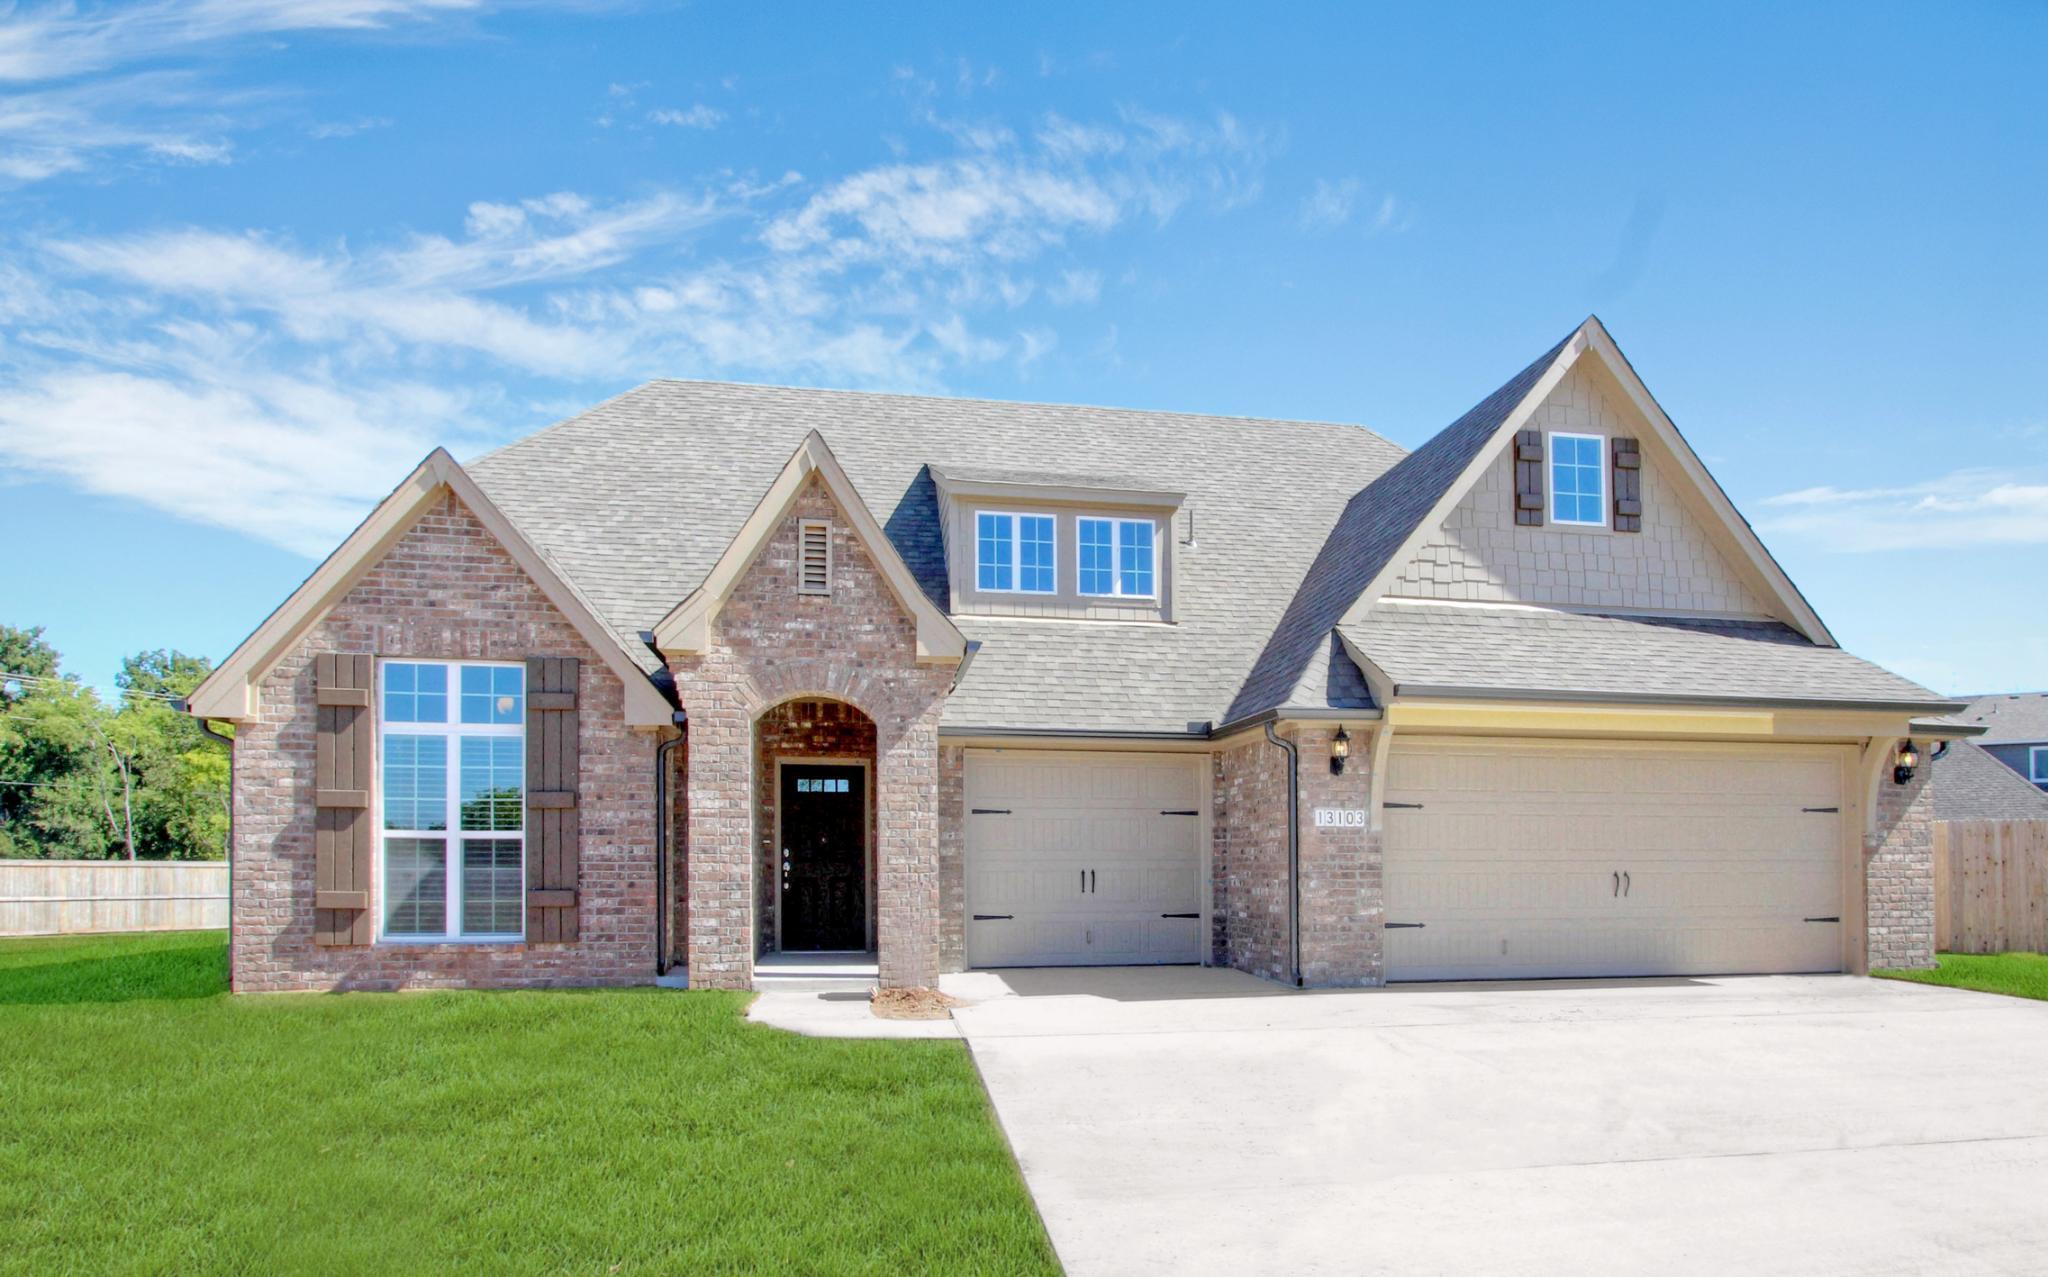 Single Family for Sale at Vintage Oaks - Lauren 6407 E. 88th St. N. Owasso, Oklahoma 74055 United States